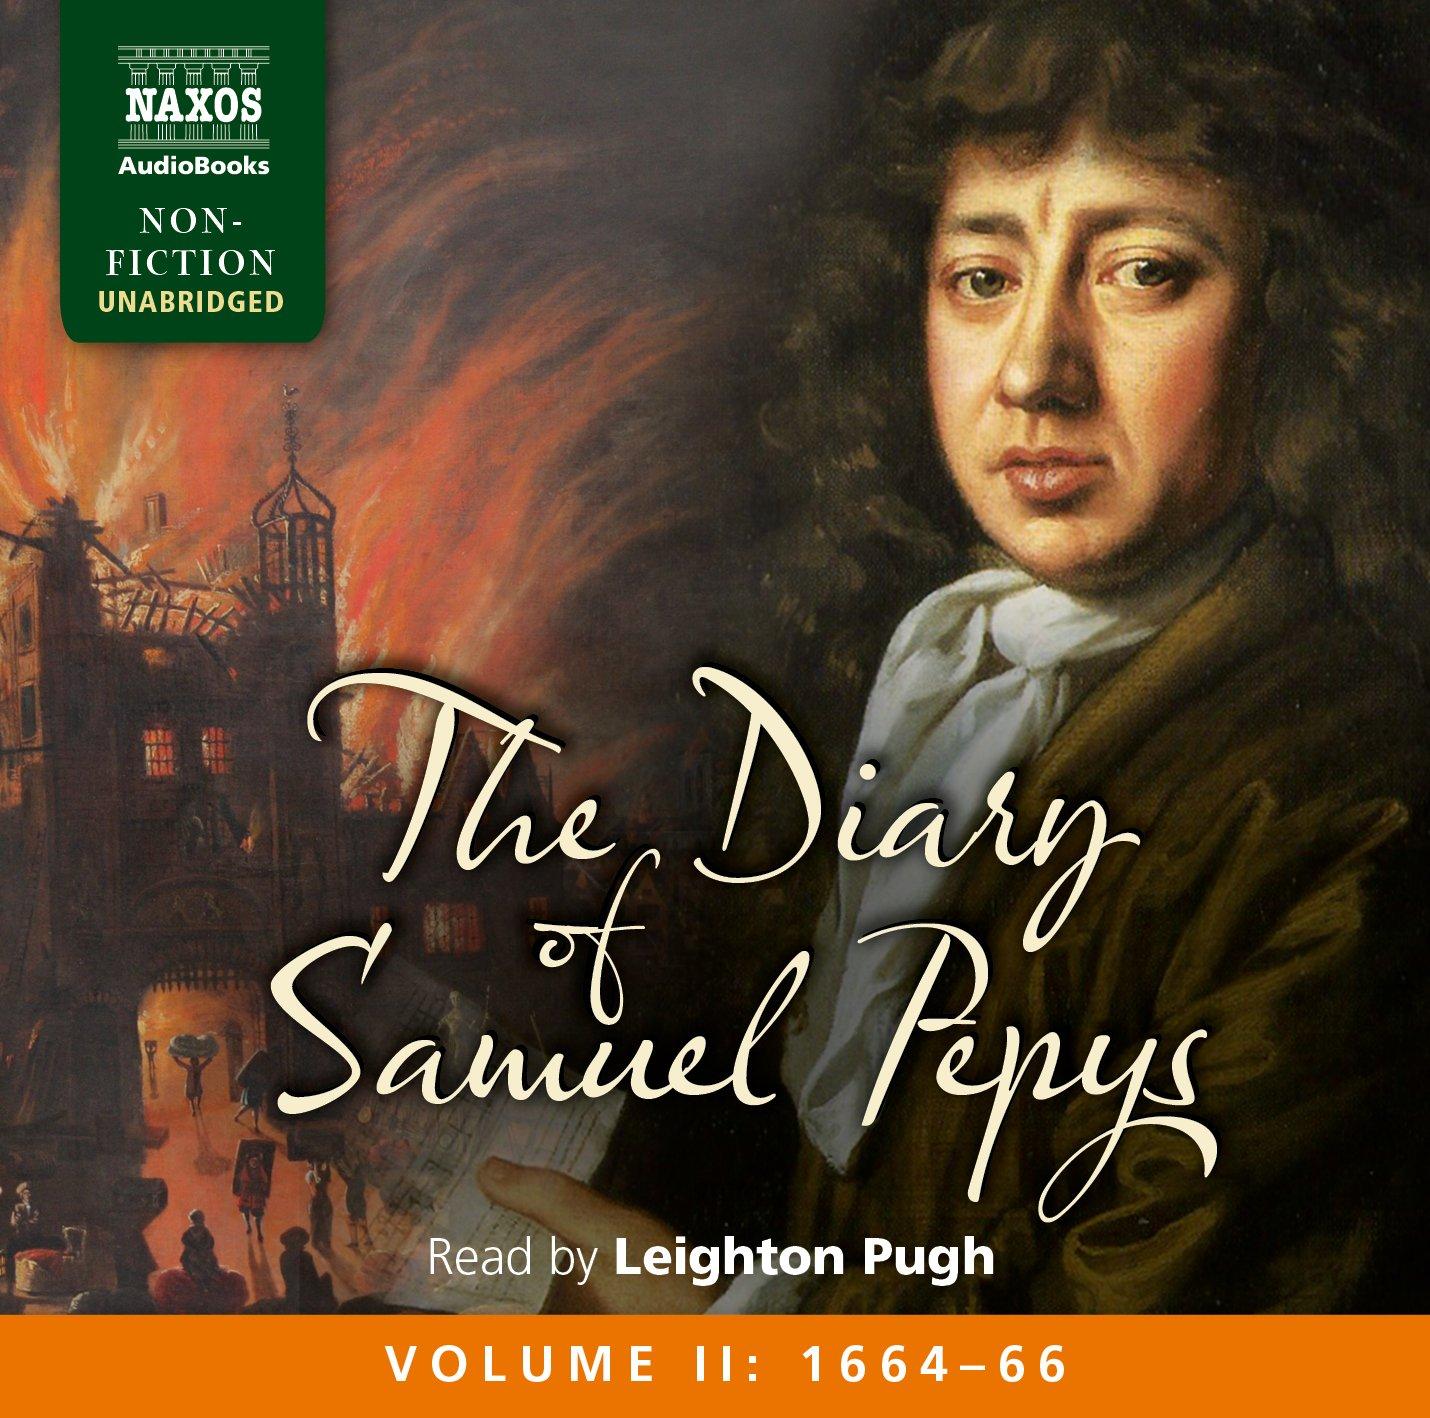 The Diary of Samuel Pepys, Volume II: 1664 - 1666 by Naxos AudioBooks